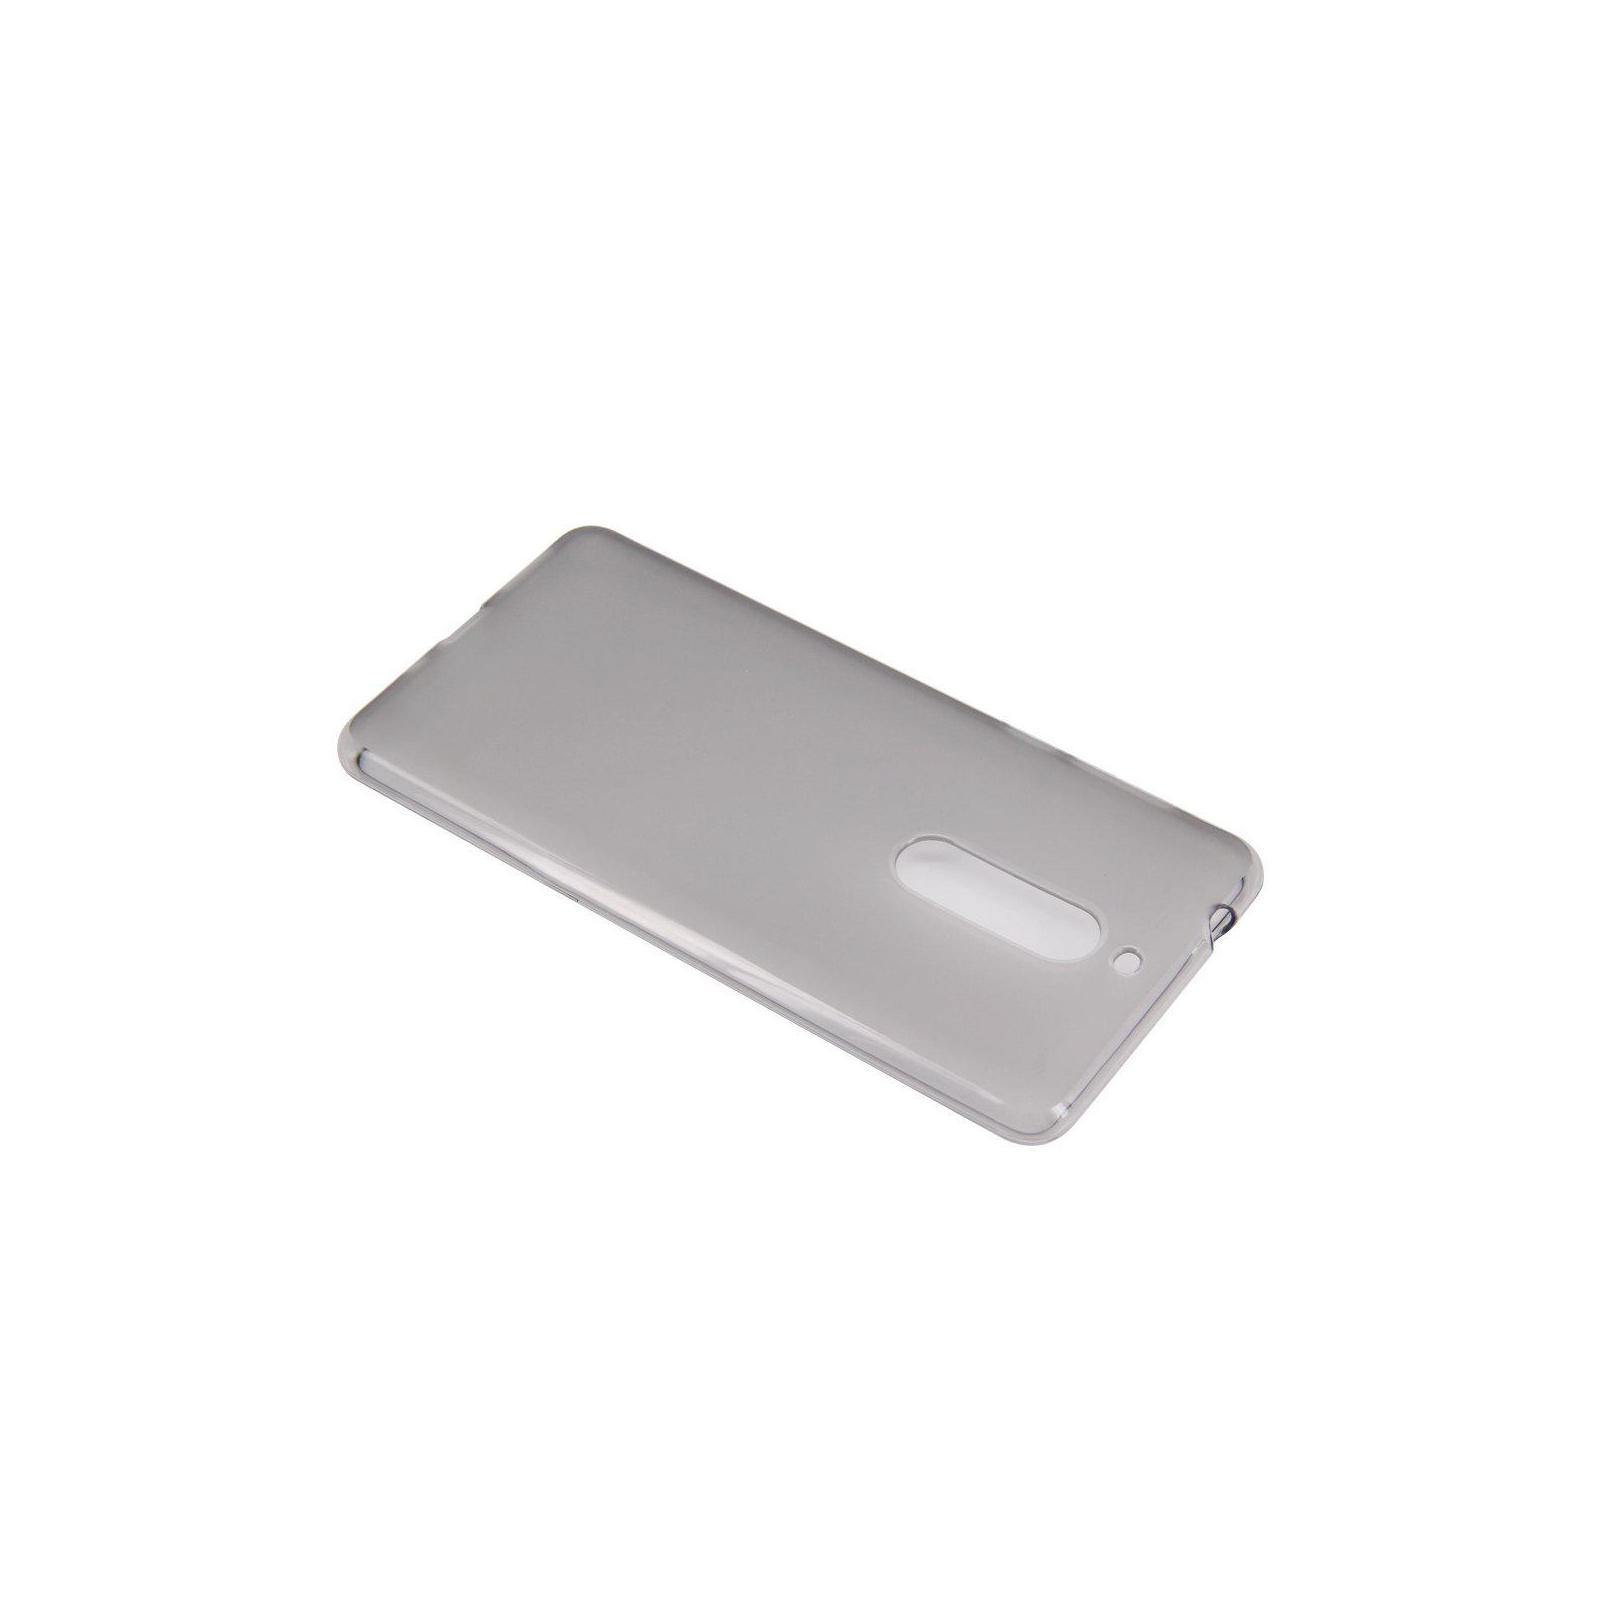 Чехол для моб. телефона SmartCase Nokia 3 TPU Clear (SC-N3) изображение 4